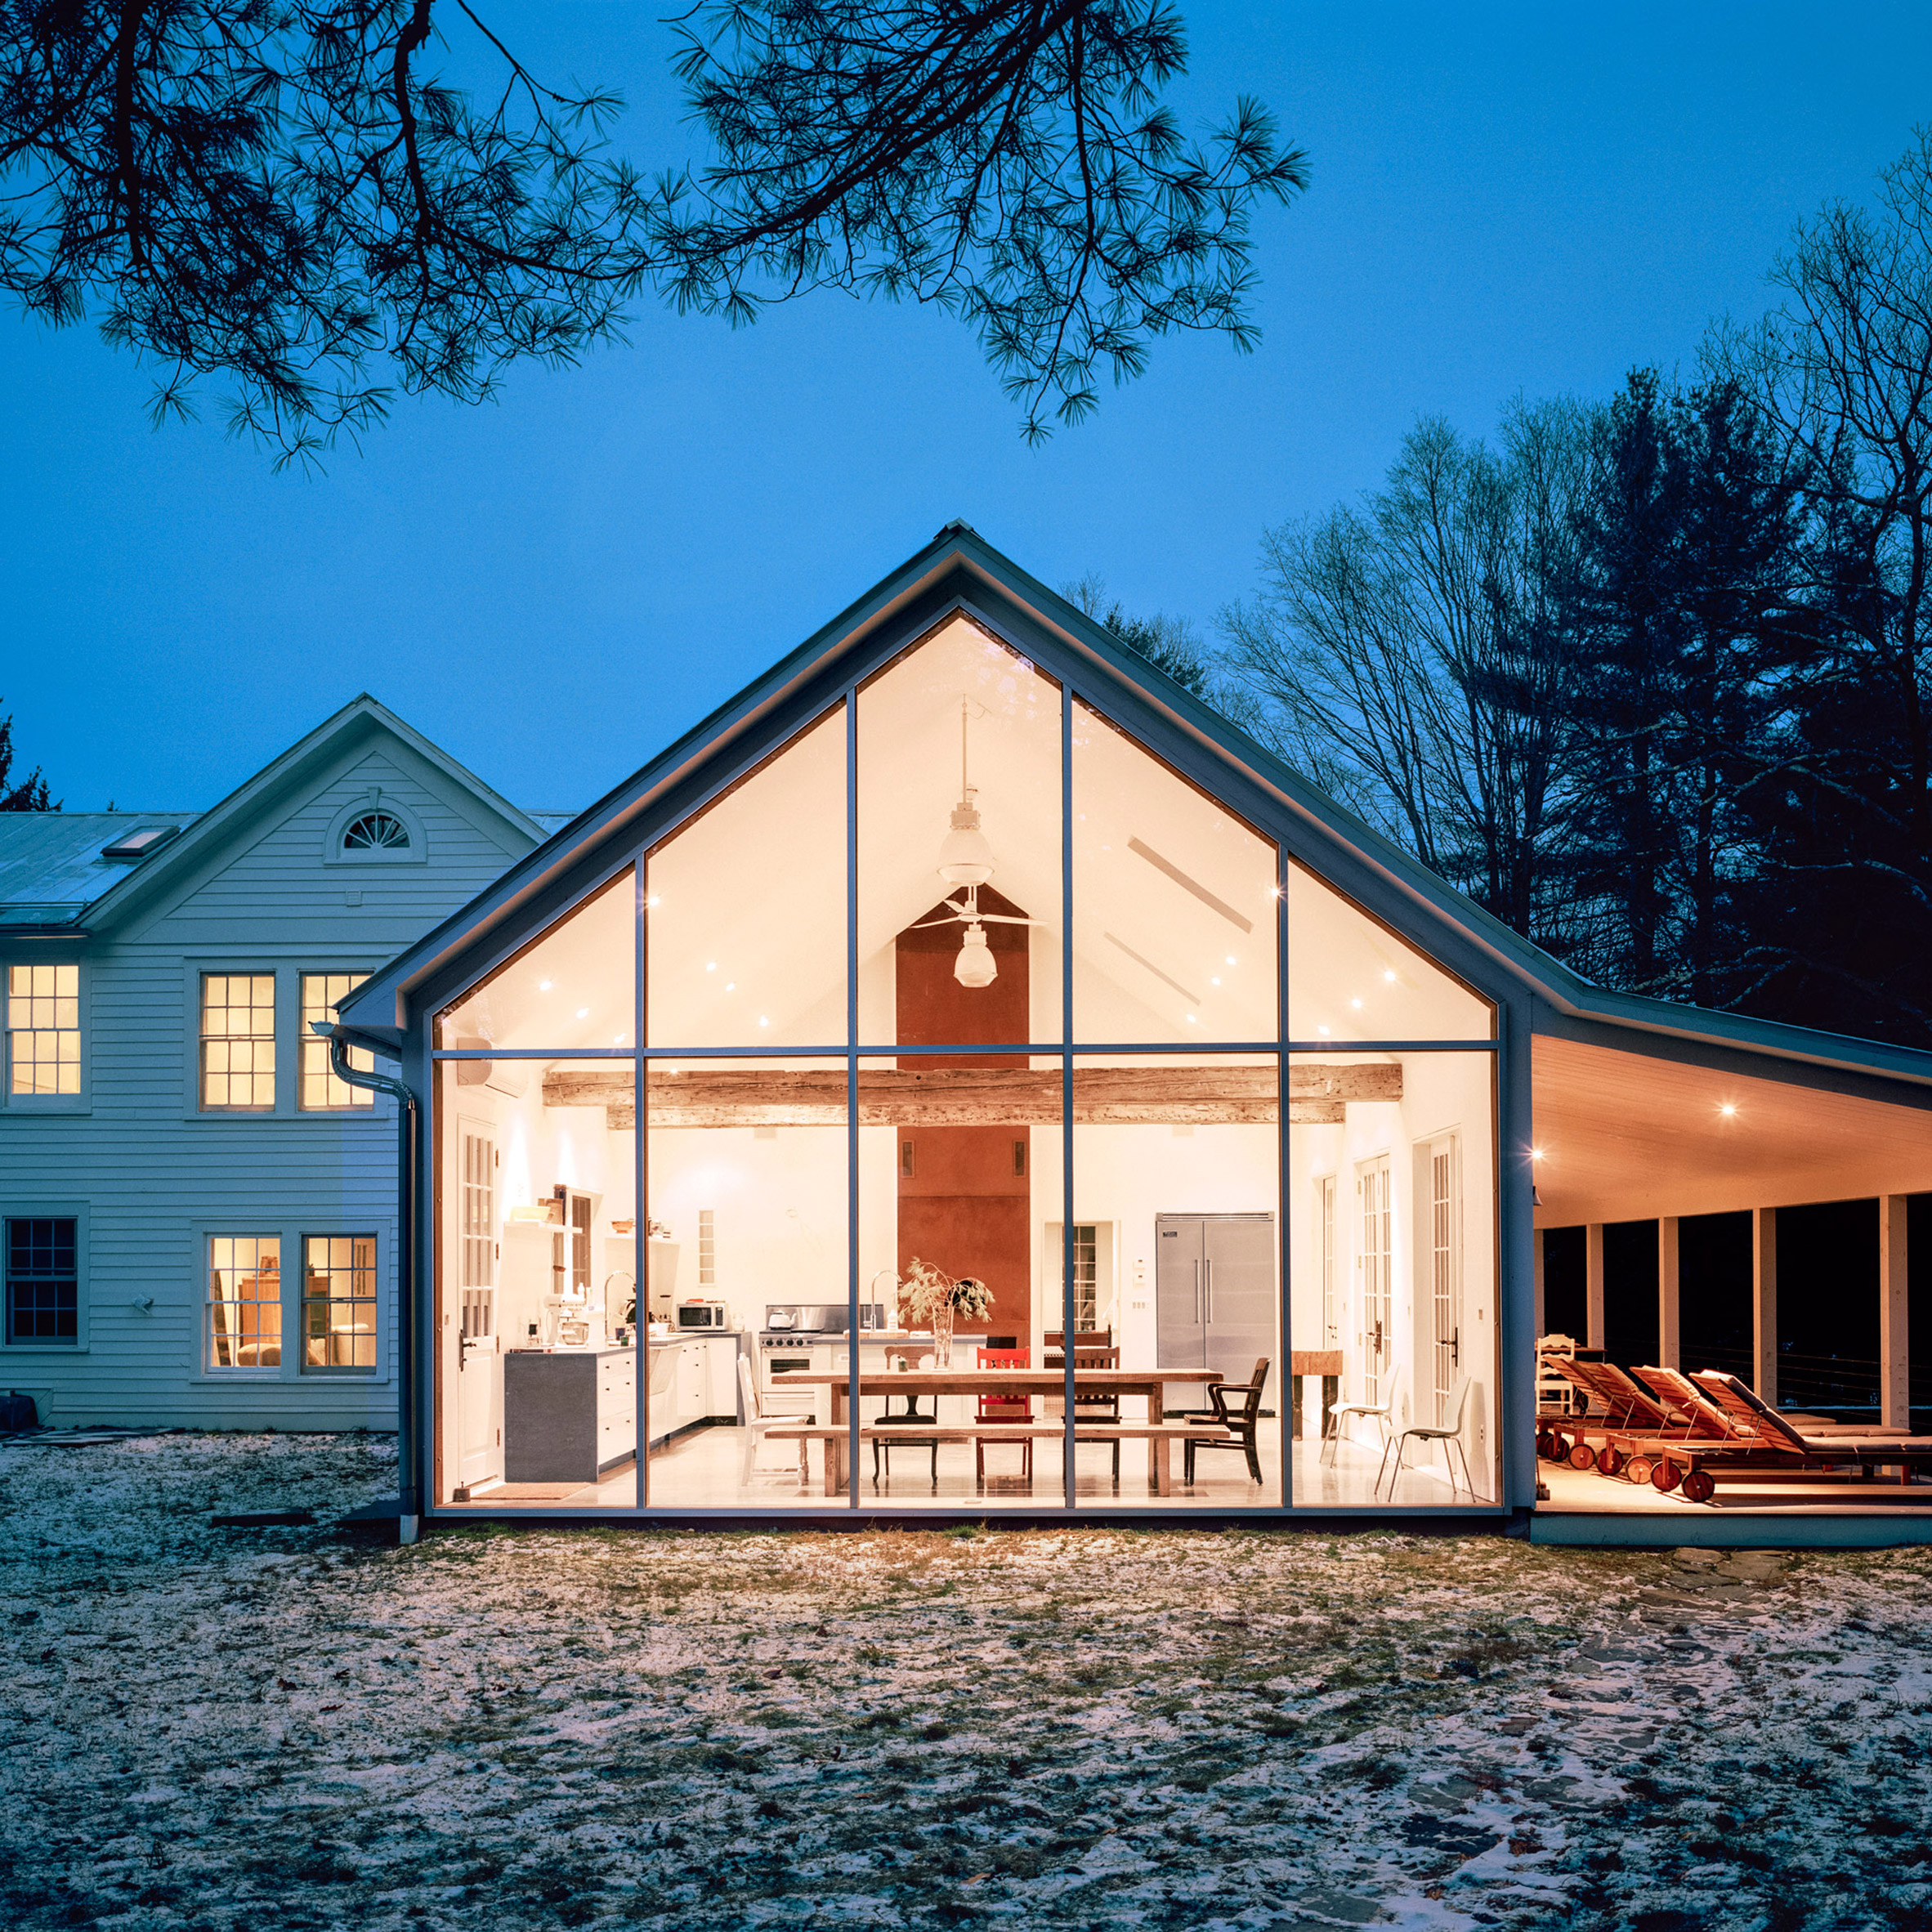 Farmhouse architecture and interior design | Dezeen on norwegian apartment, norwegian homestead, norwegian outhouse, norwegian open sandwich, norwegian farm life,